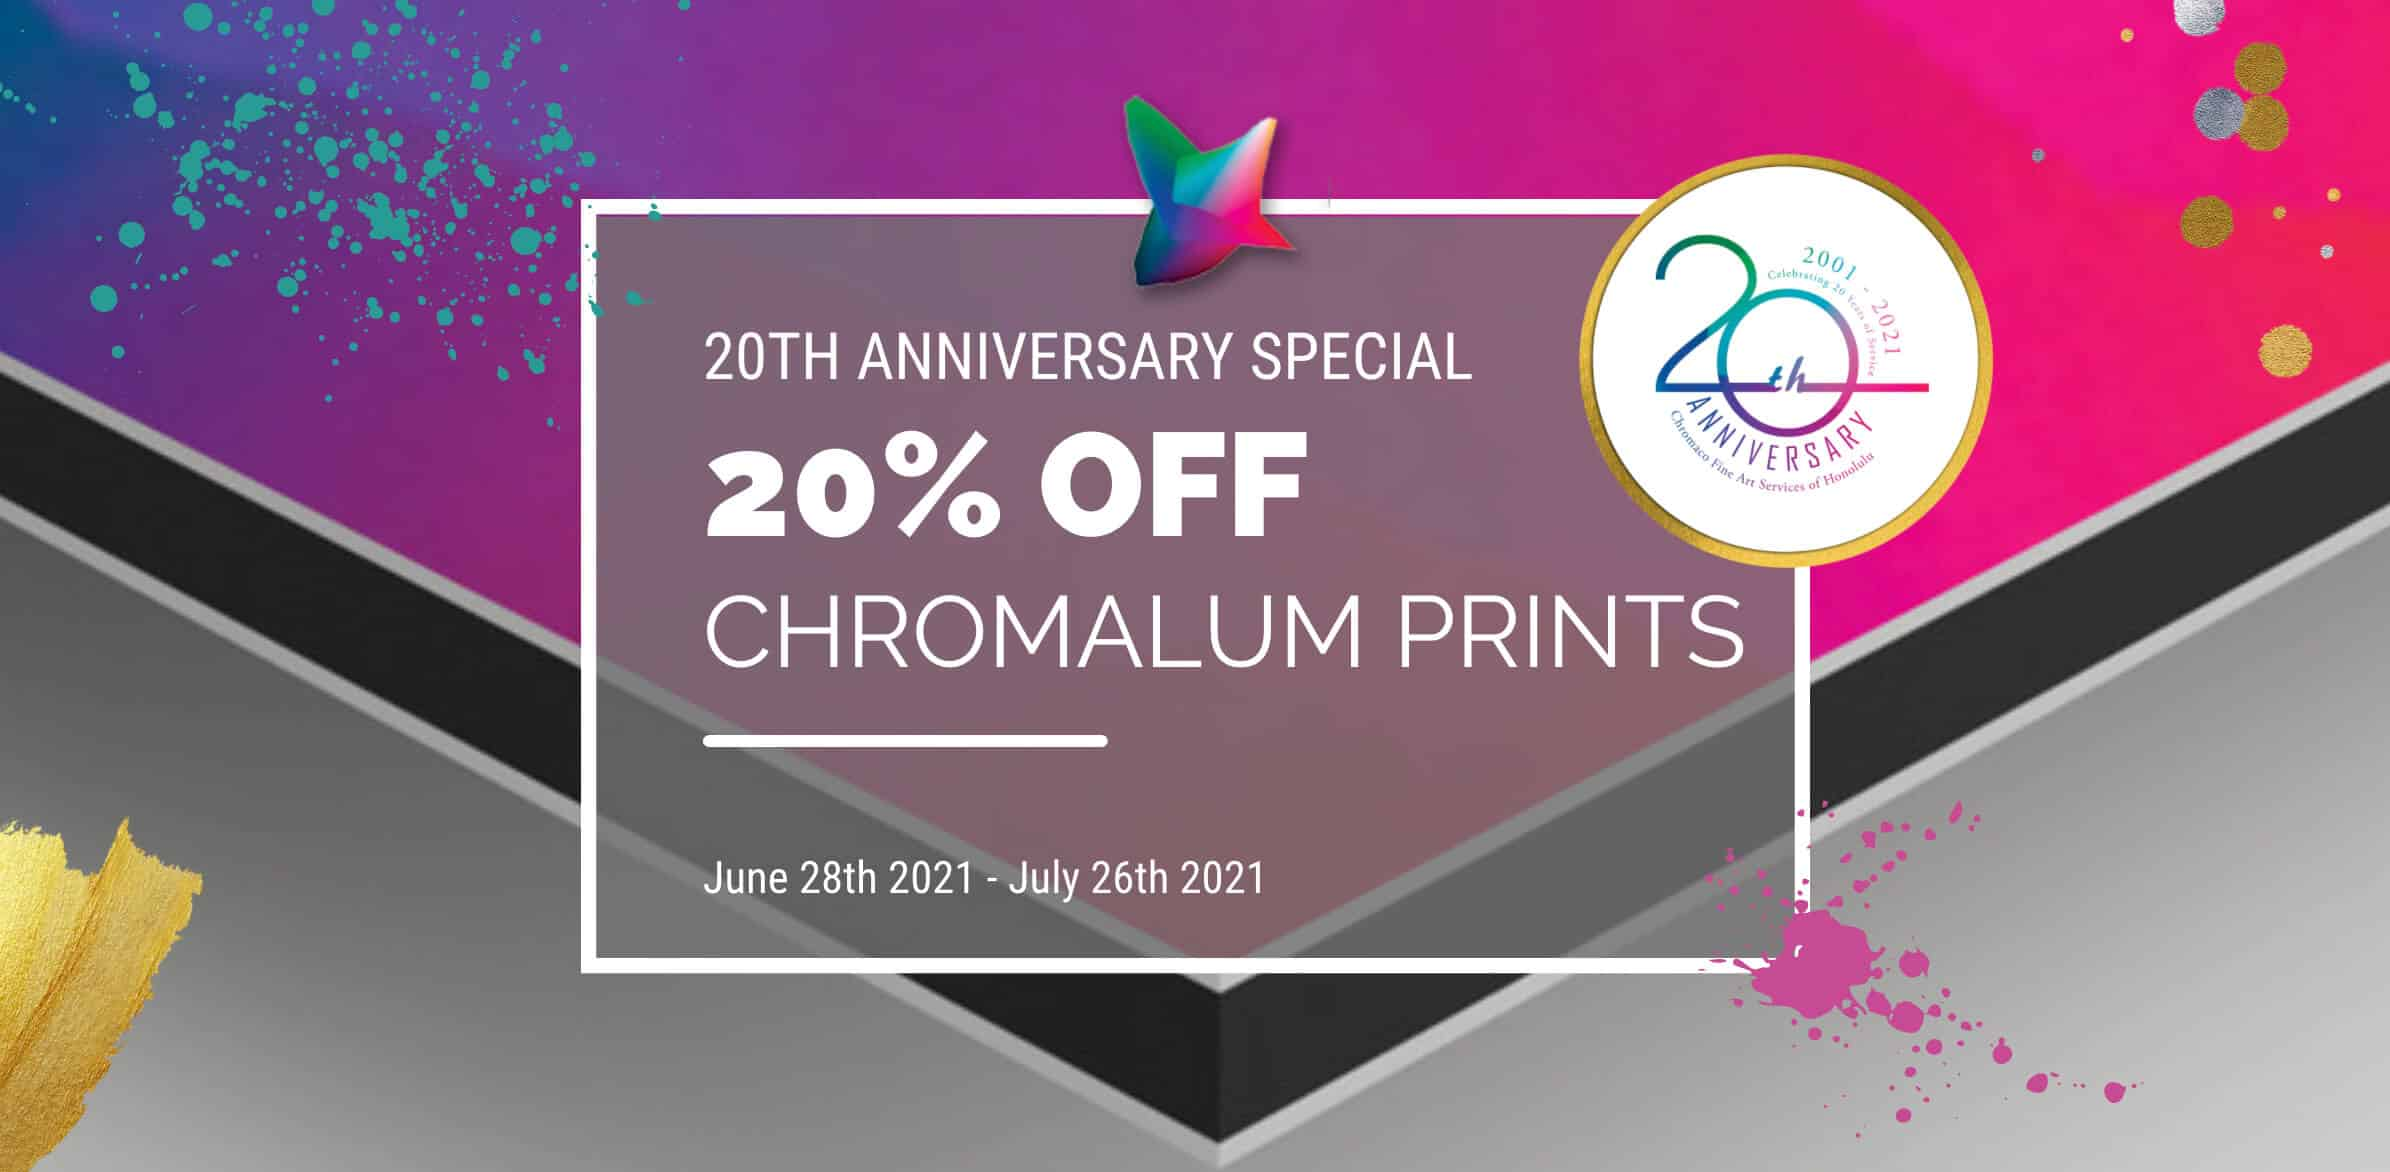 Chromalum Special Small Graphic